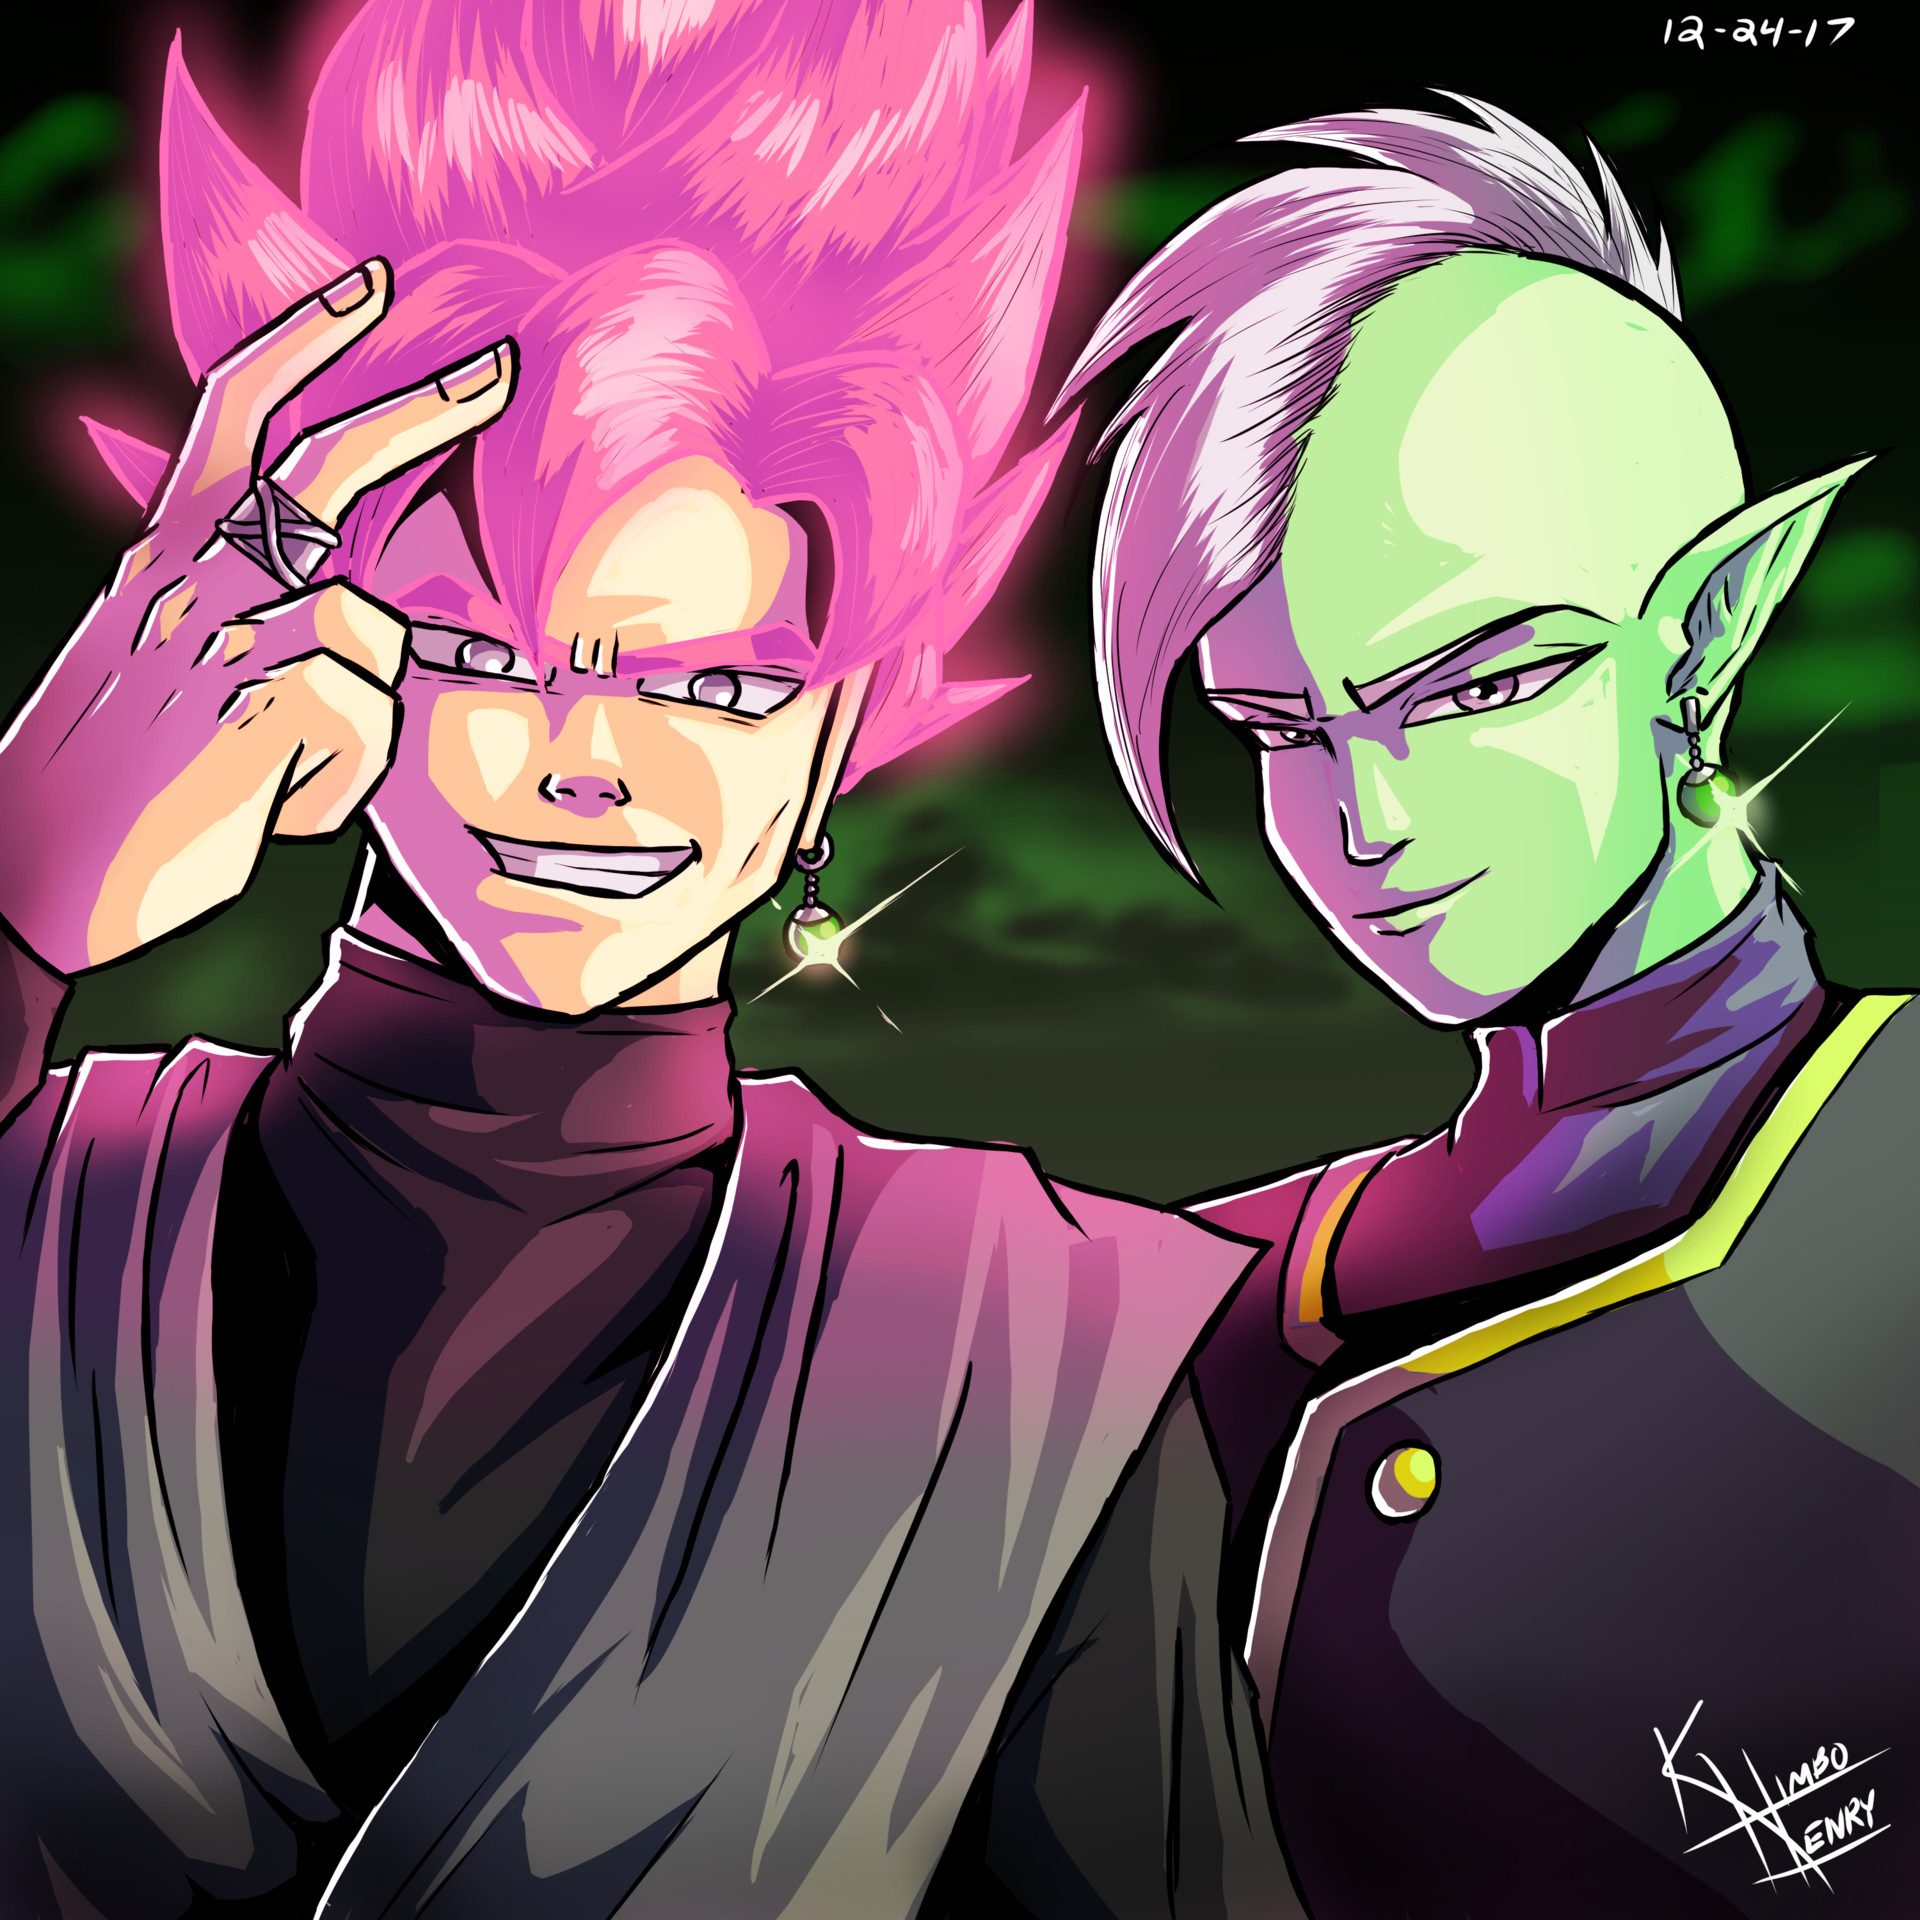 Artstation - Goku Black  Zamasu, Kimbo Henry-4678